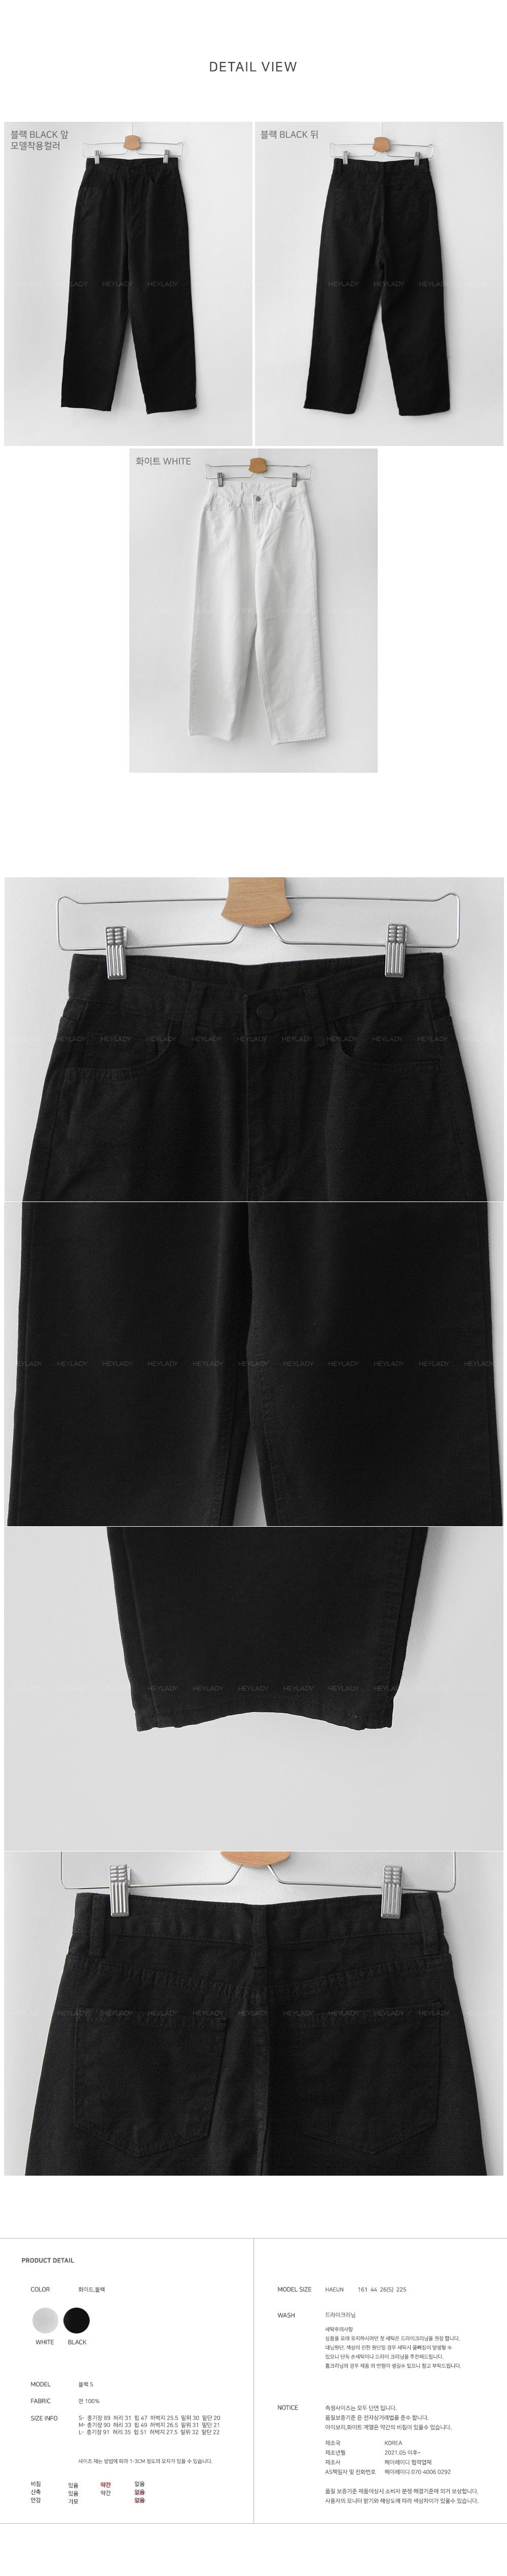 Rex Date Cotton Pants